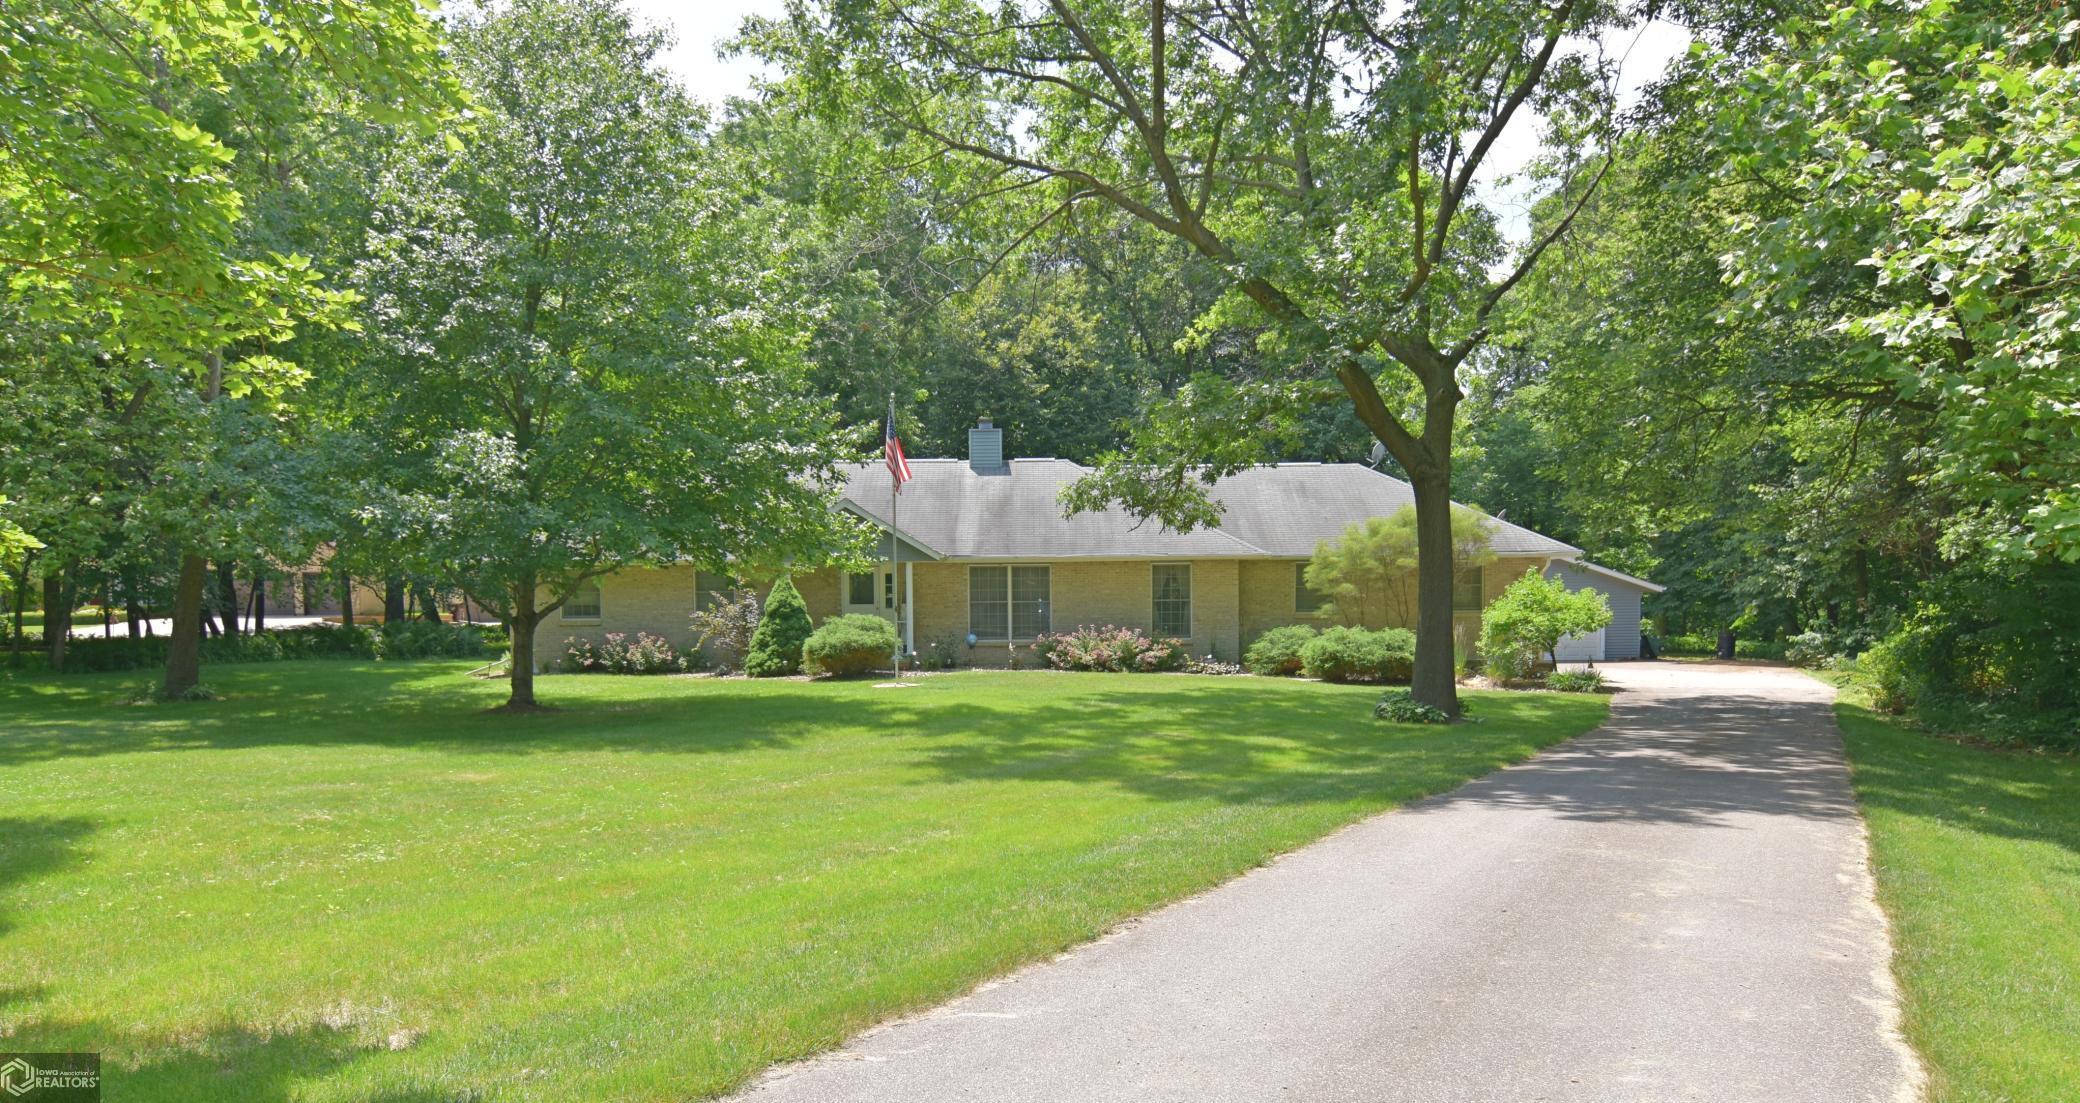 2375 186th #J Property Photo - Marshalltown, IA real estate listing